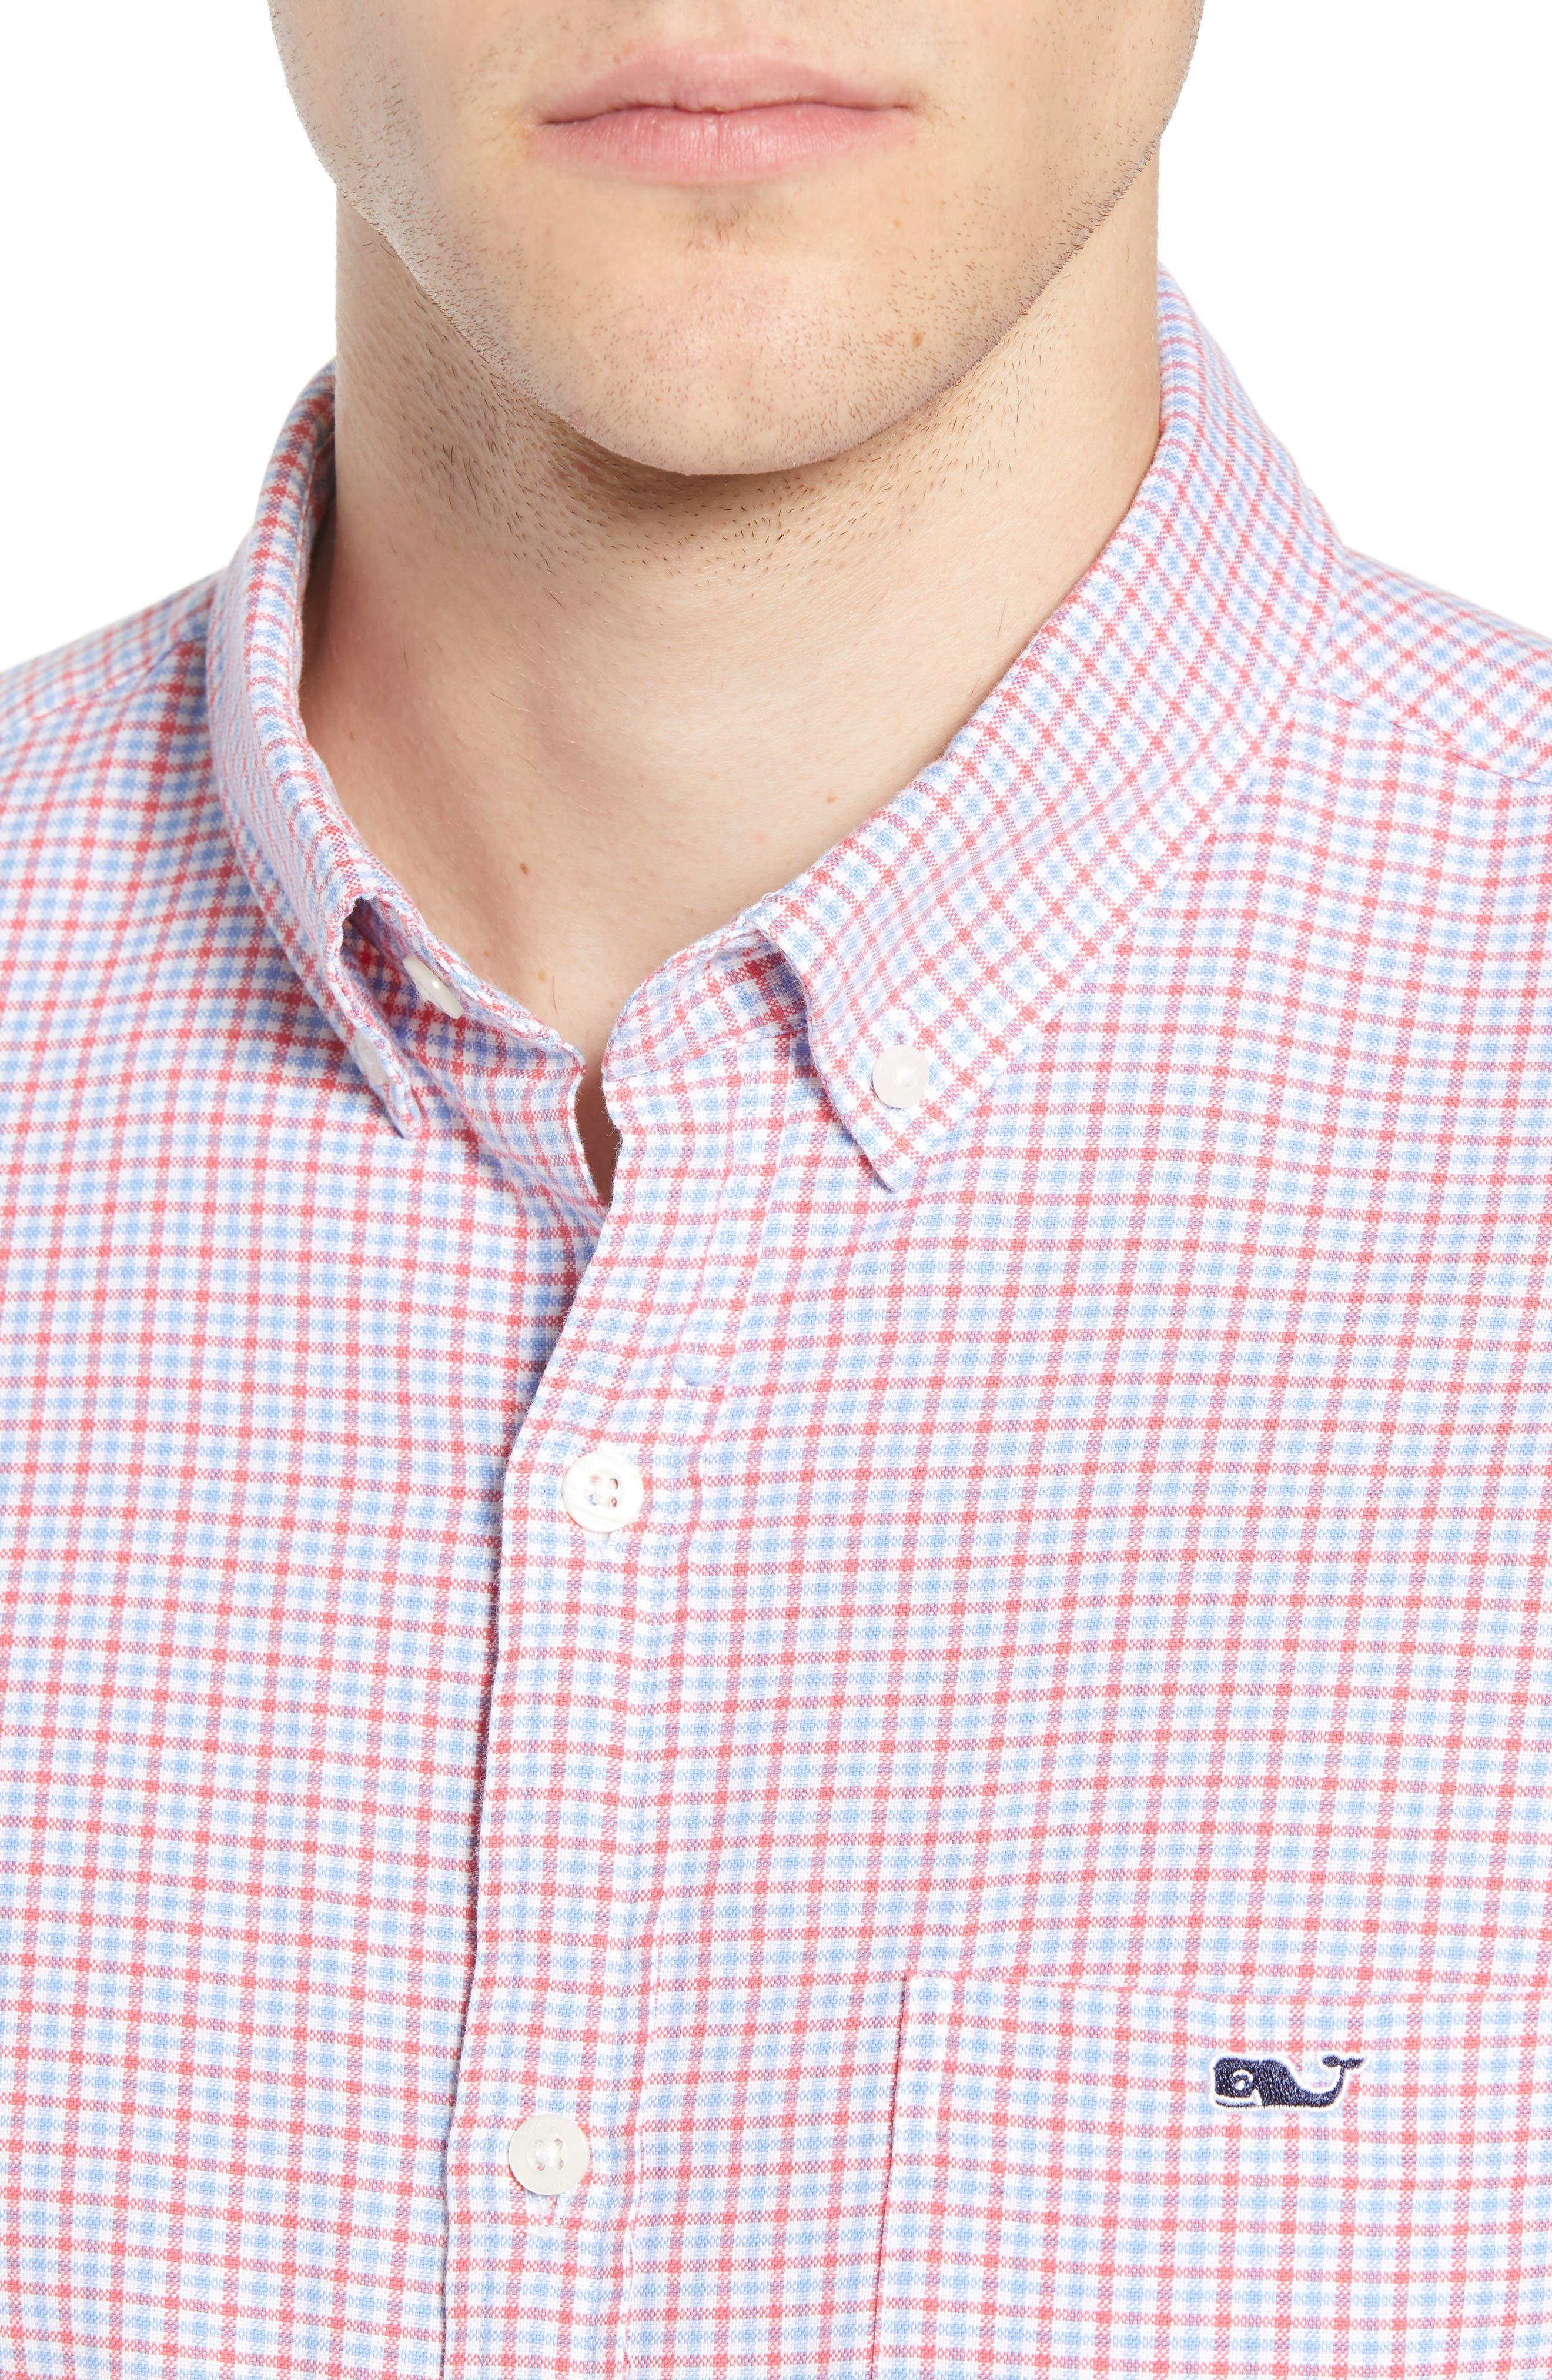 Slim Tucker 2 Check Sport Shirt,                             Alternate thumbnail 2, color,                             SAILORS RED